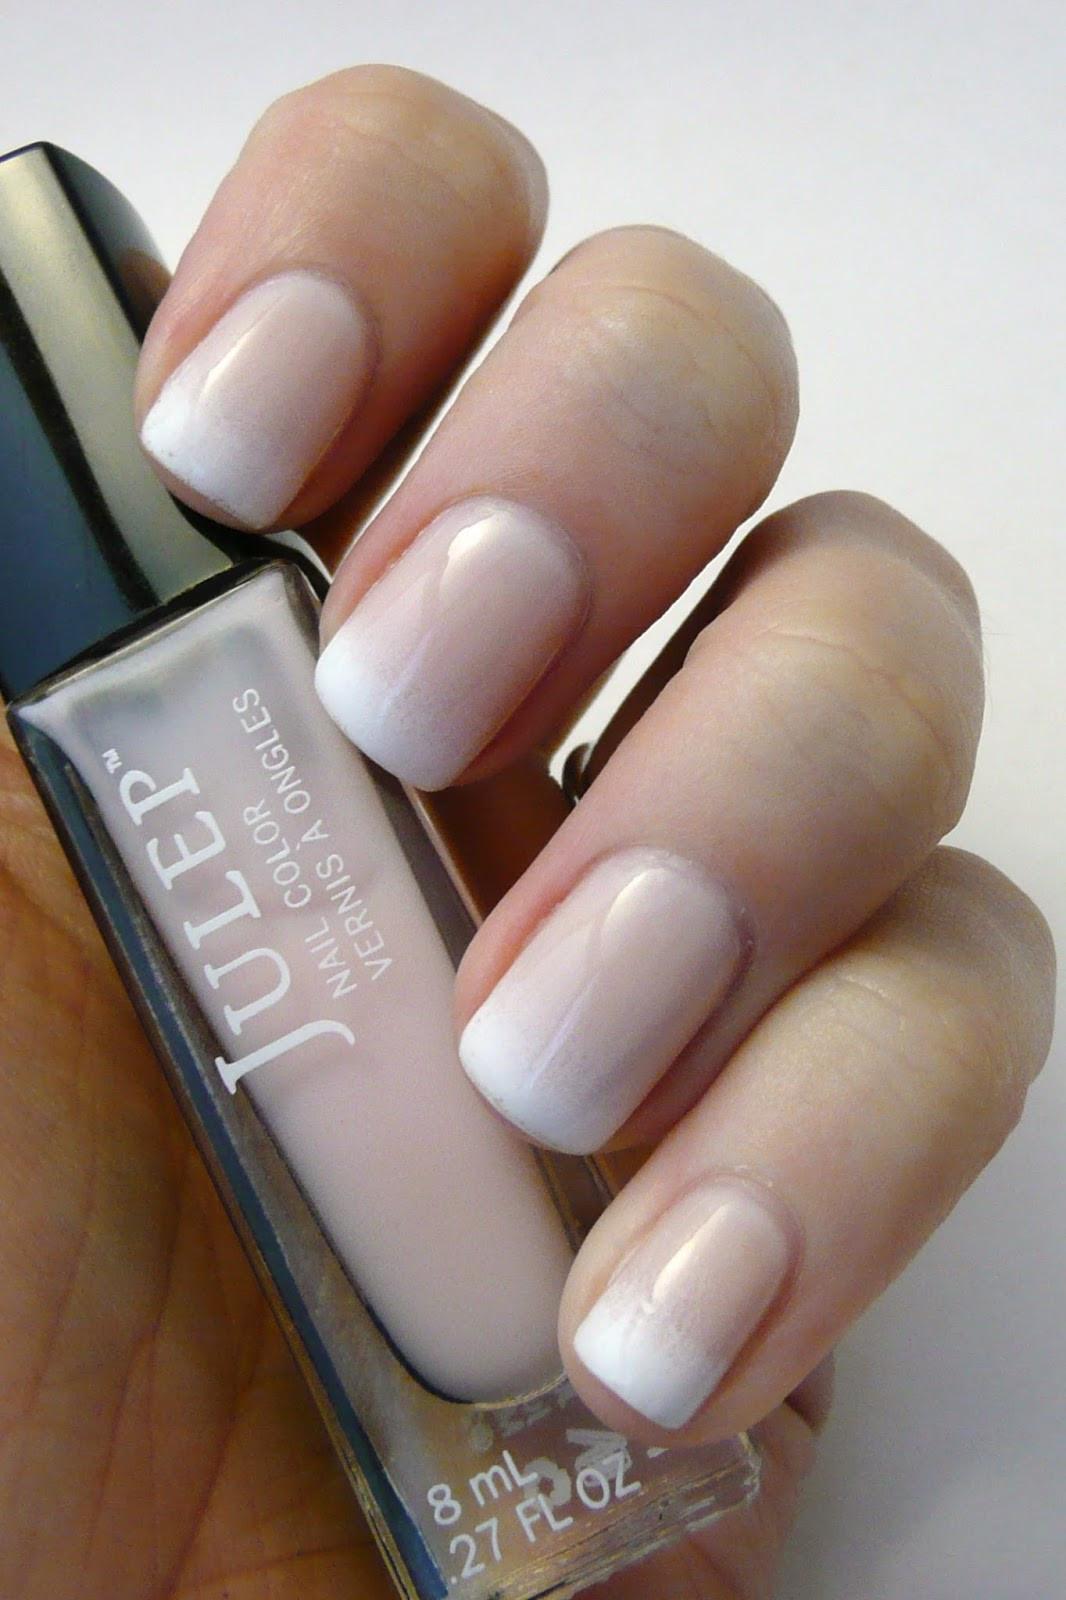 Maniküre French  Casa de Polish Gra nt French Manicure